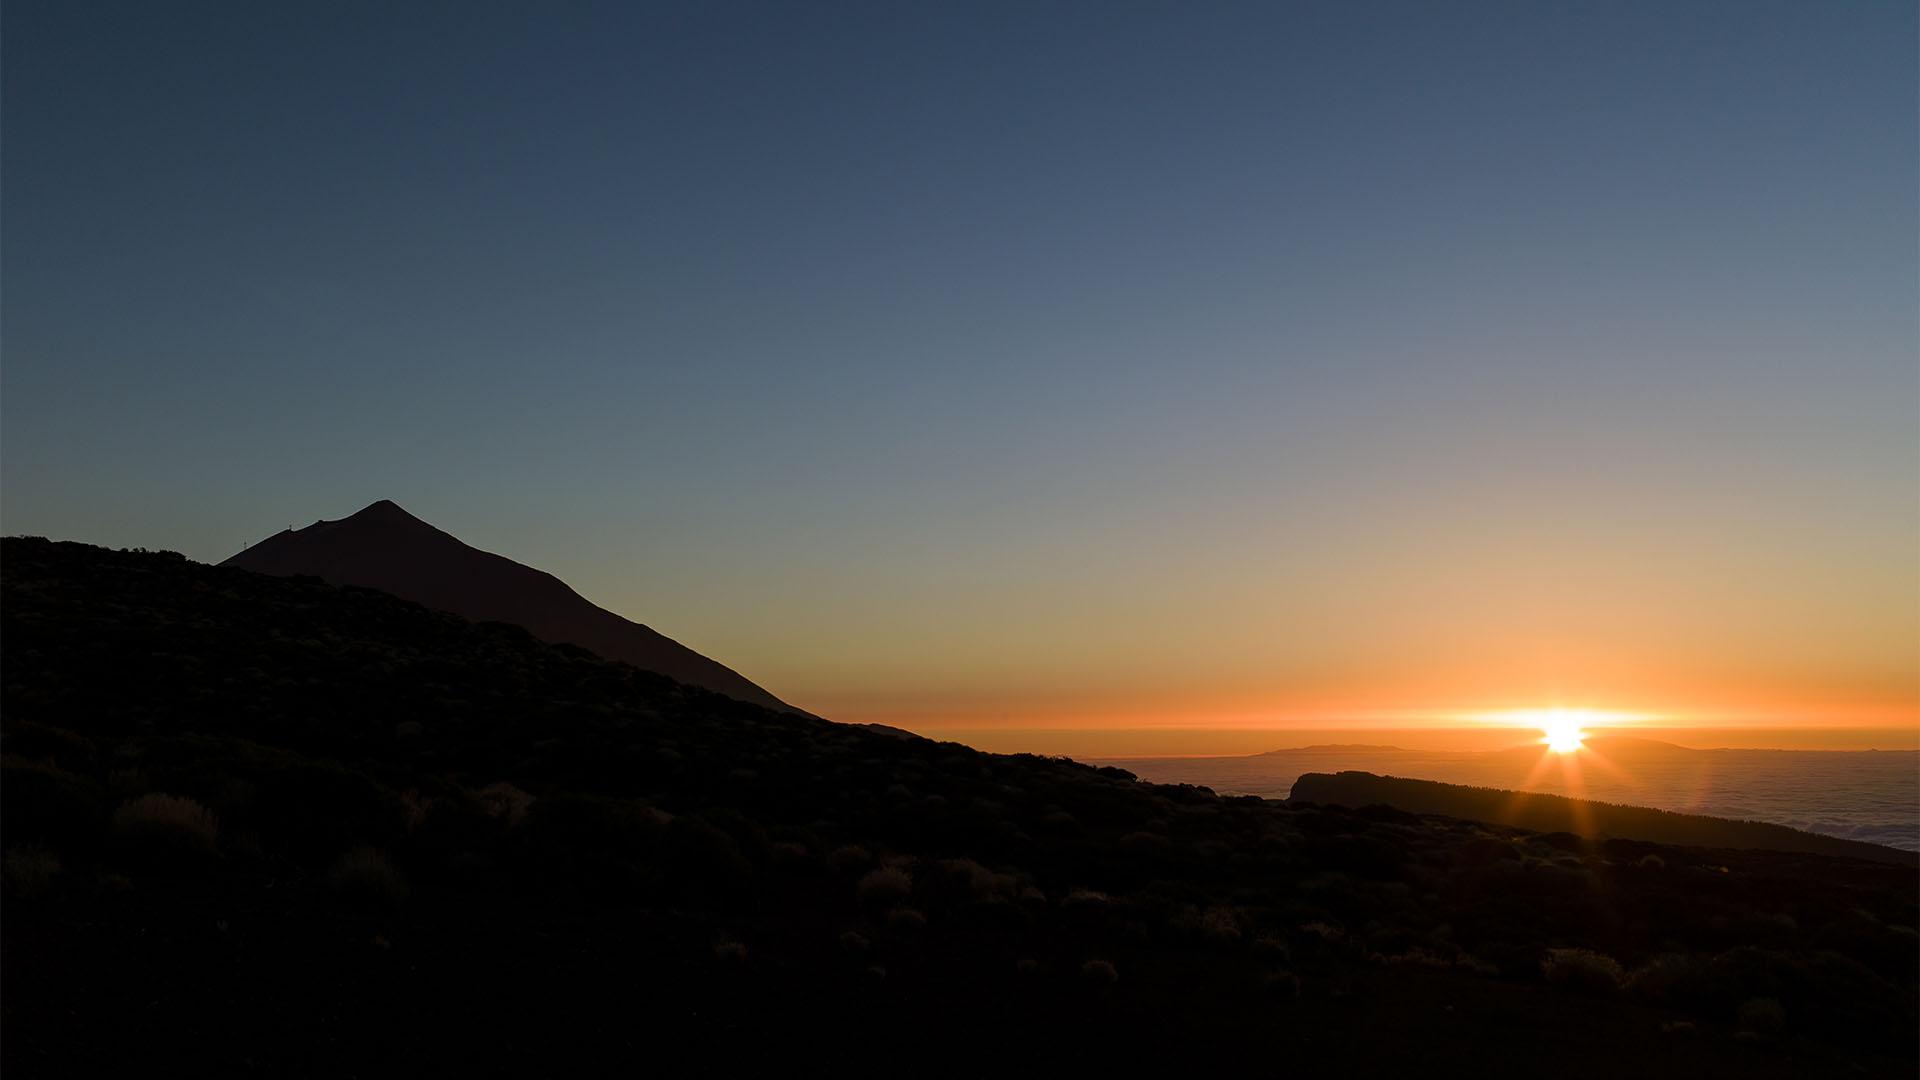 Sonnenuntergang am Pico del Teide Teneriffa.